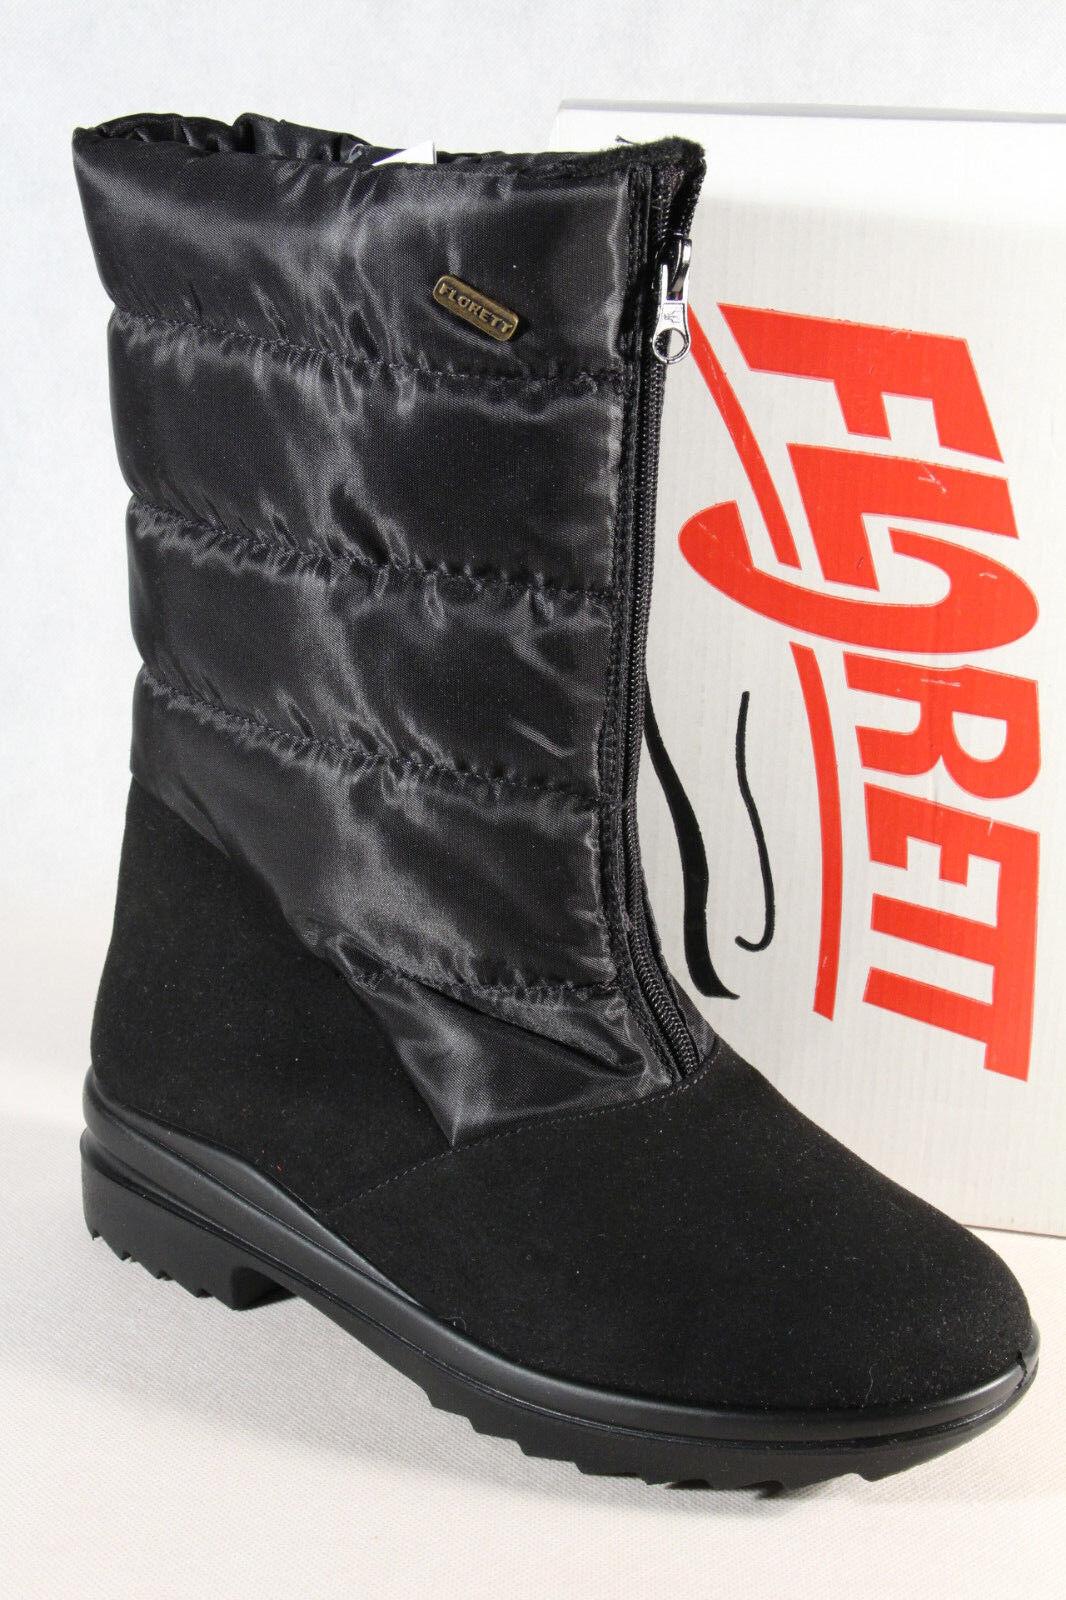 Schuhe SCATOLA Weiß Frau 720ZEPPA TO BEIGE Wildleder